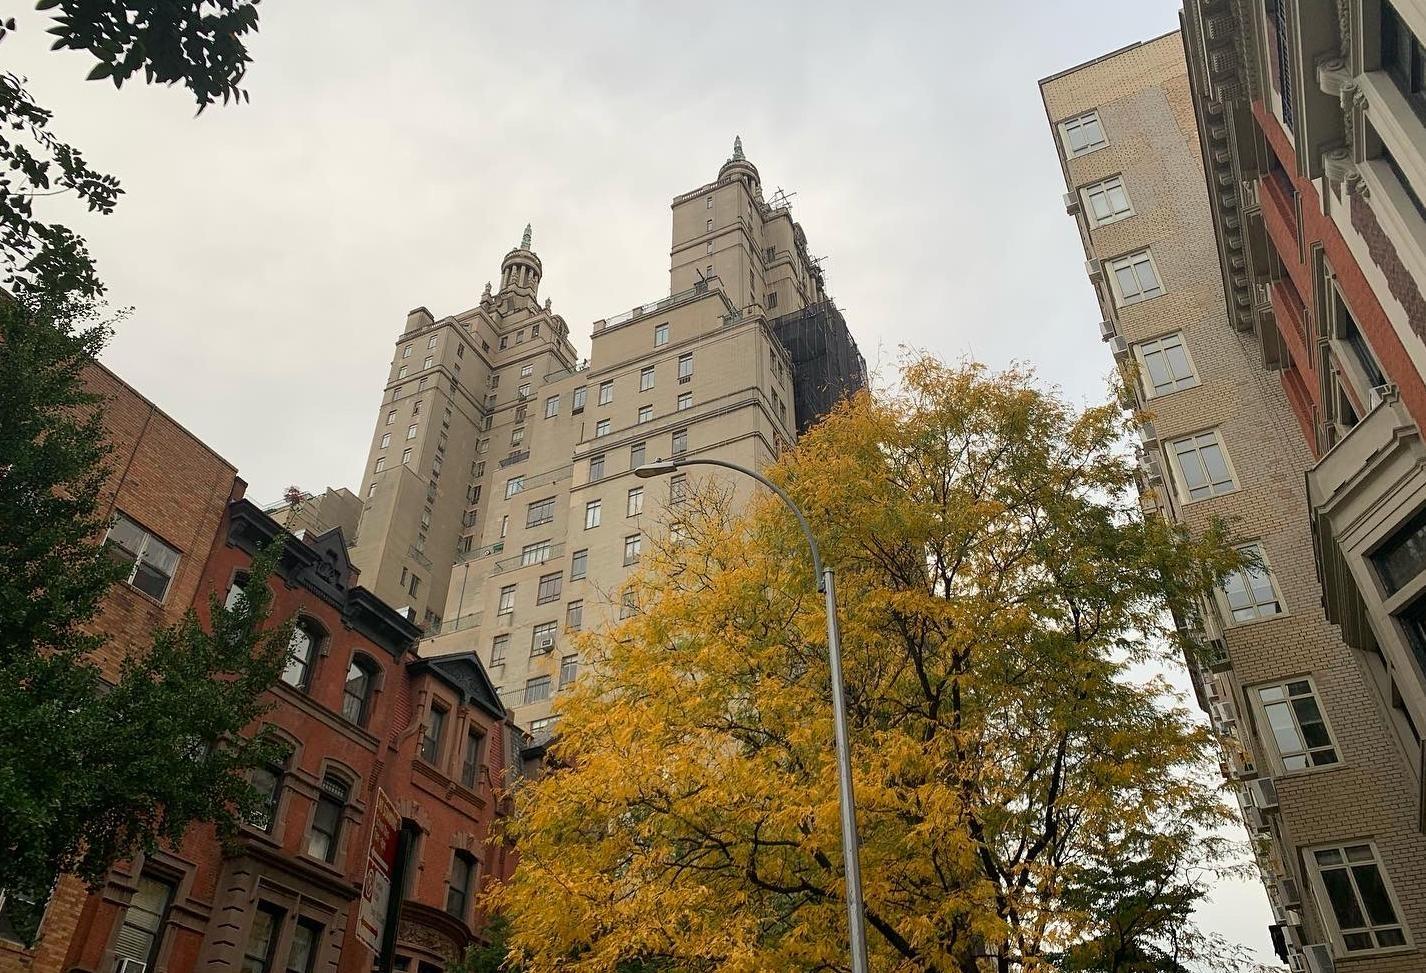 NYC's Housing Crisis Worsens As Legislators Consider Band-Aid Solutions